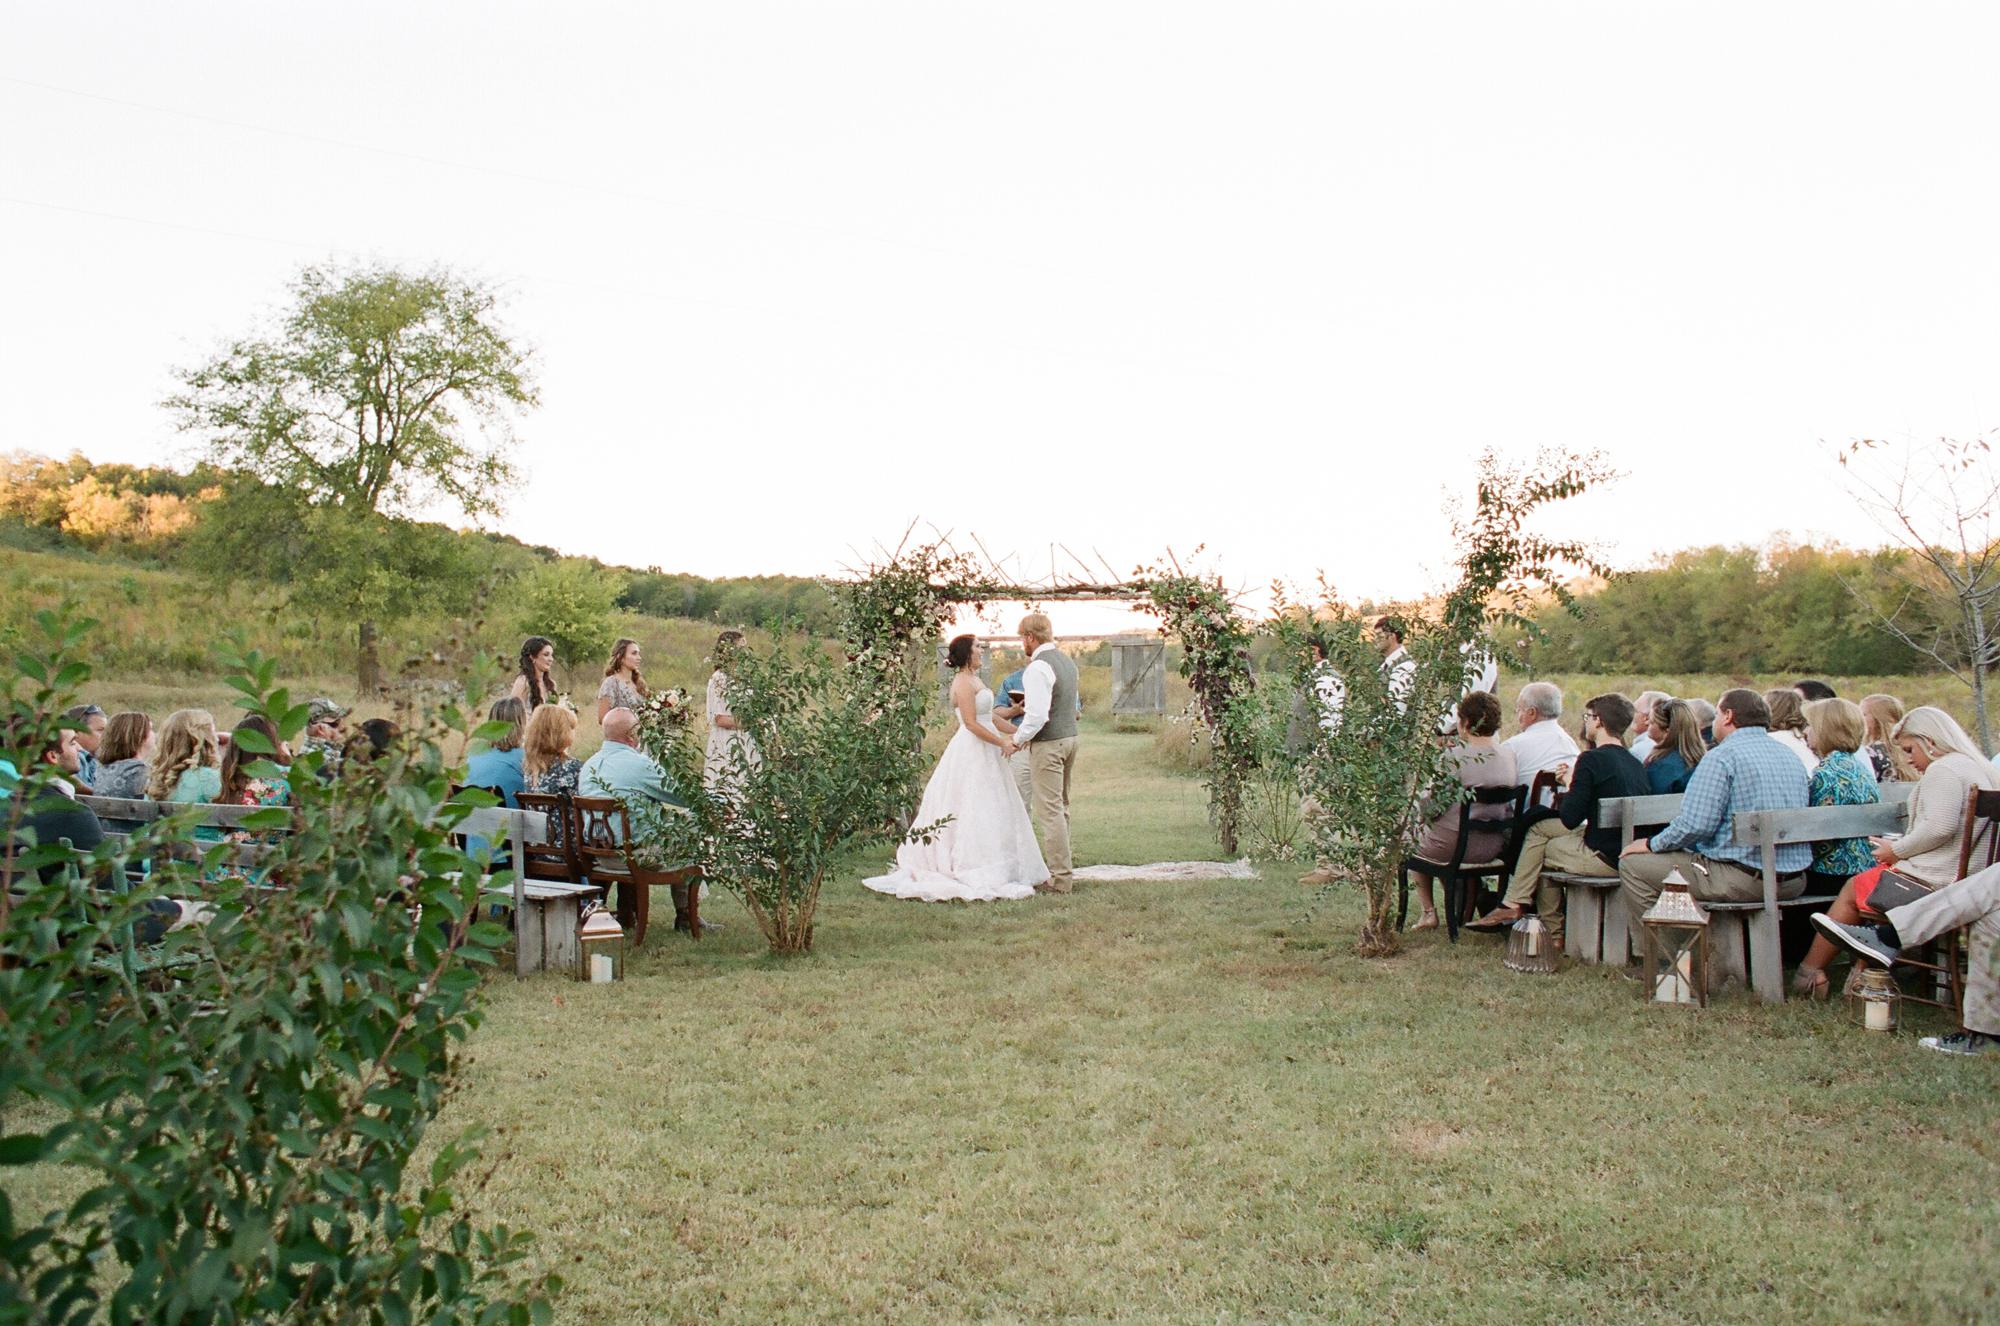 southern-weddings-film-photographer_0044.jpg